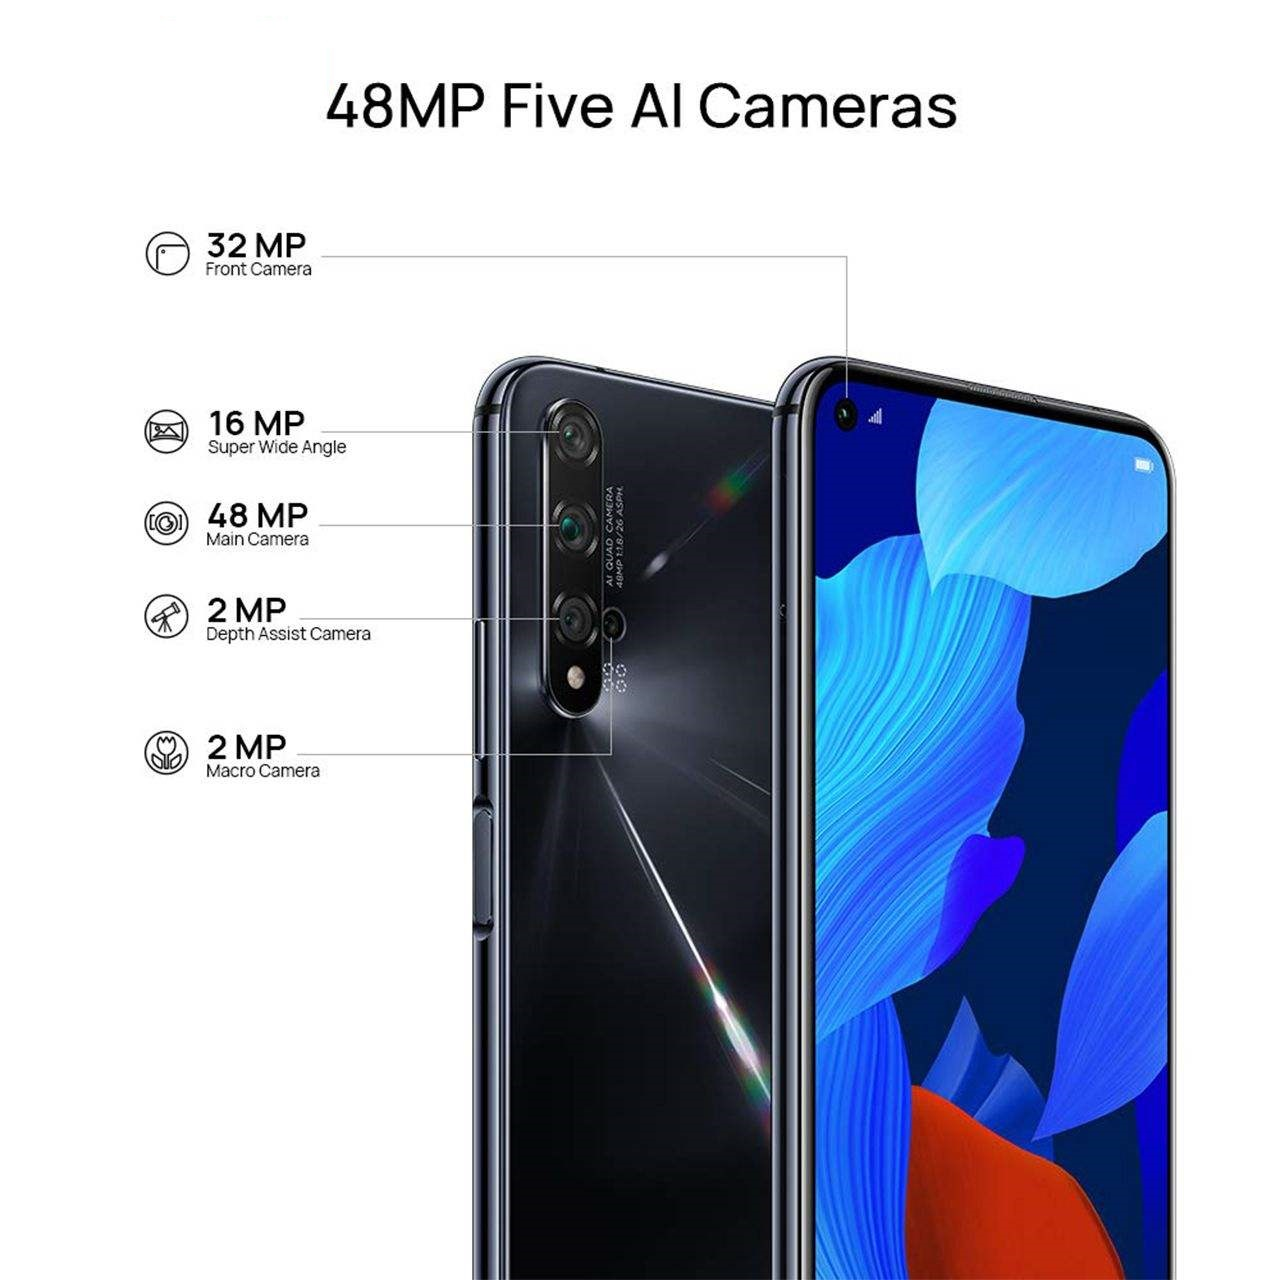 Huawei Nove 5T 128GB Mobile Phone huawei nova 5t 128gb mobile phone Huawei Nova 5T 128GB Mobile Phone Huawei Nova 5T 128GB Mobile Phone